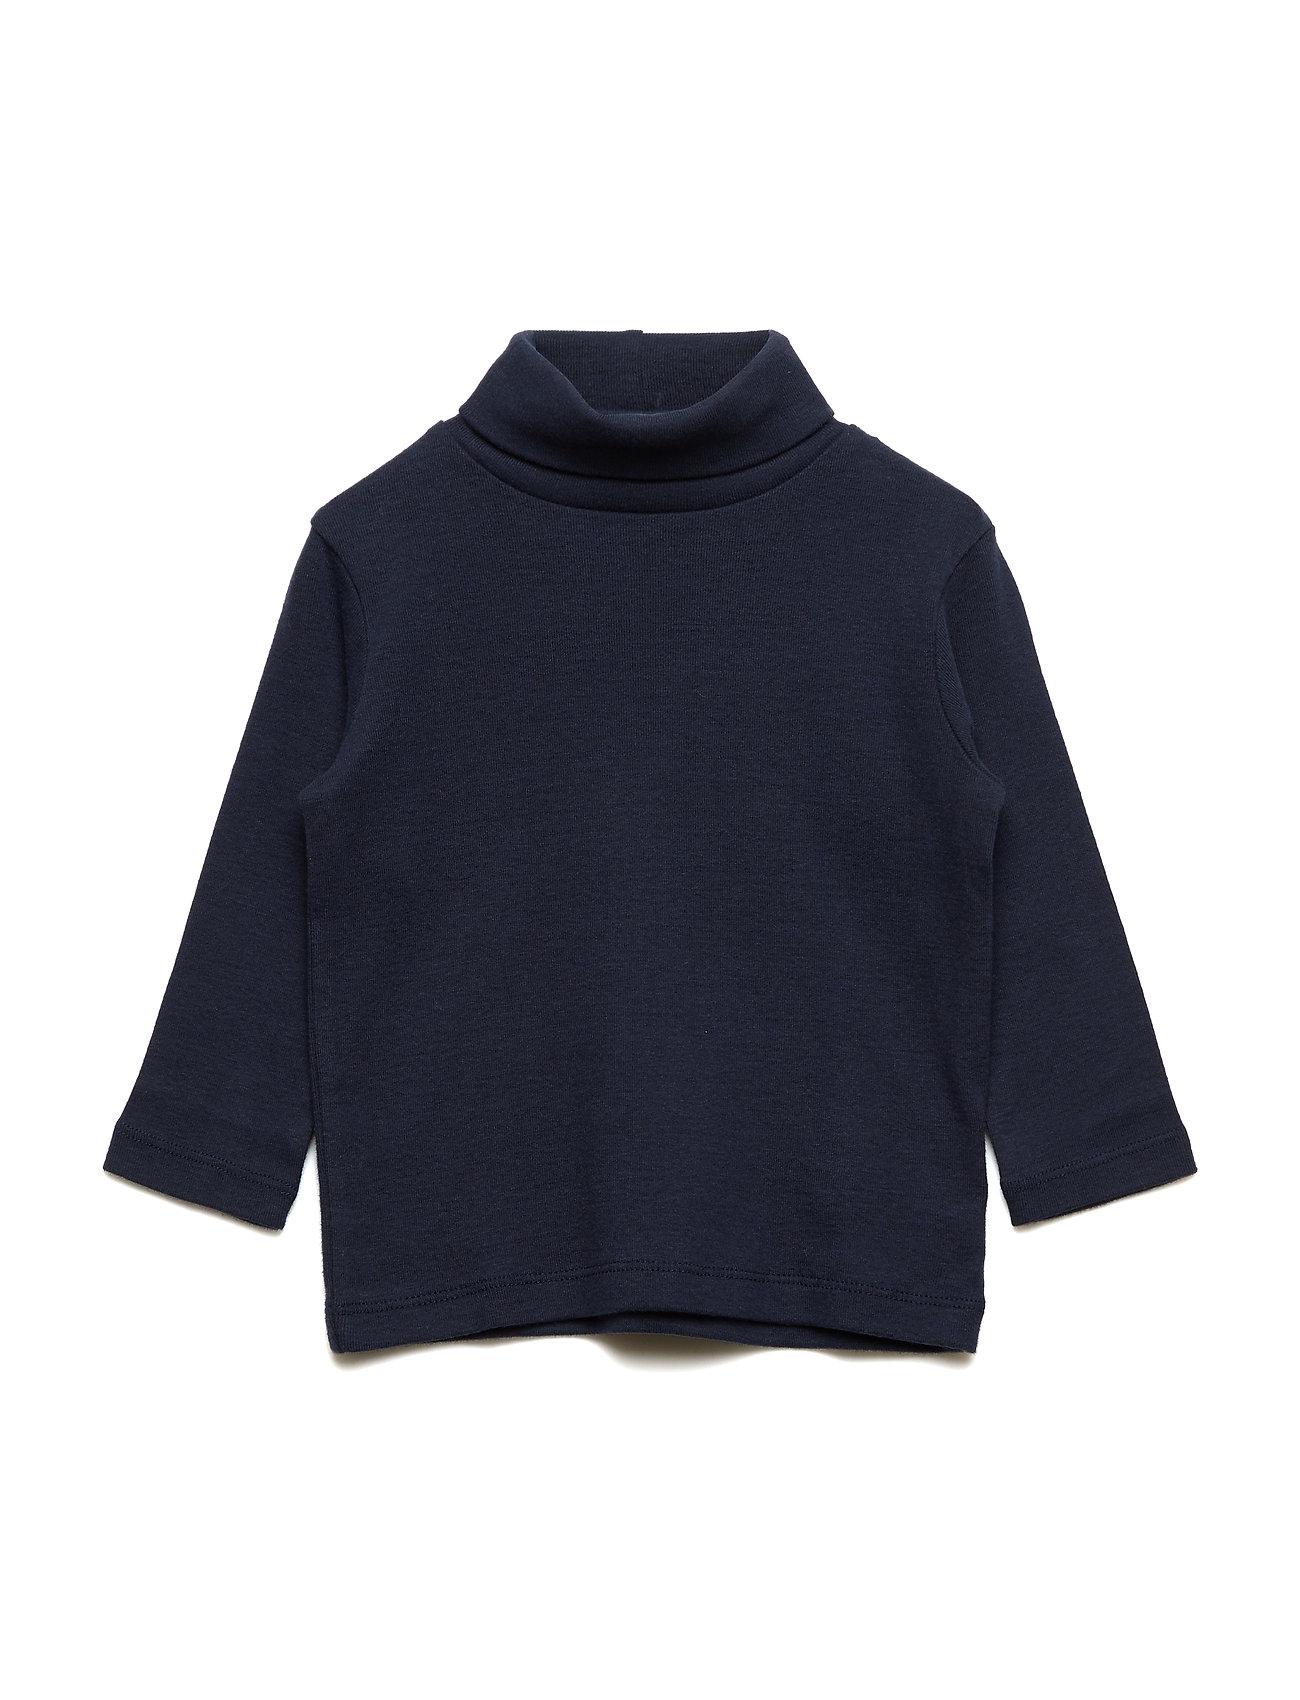 GAP Toddler Long Sleeve Turtleneck - BLUE GALAXY